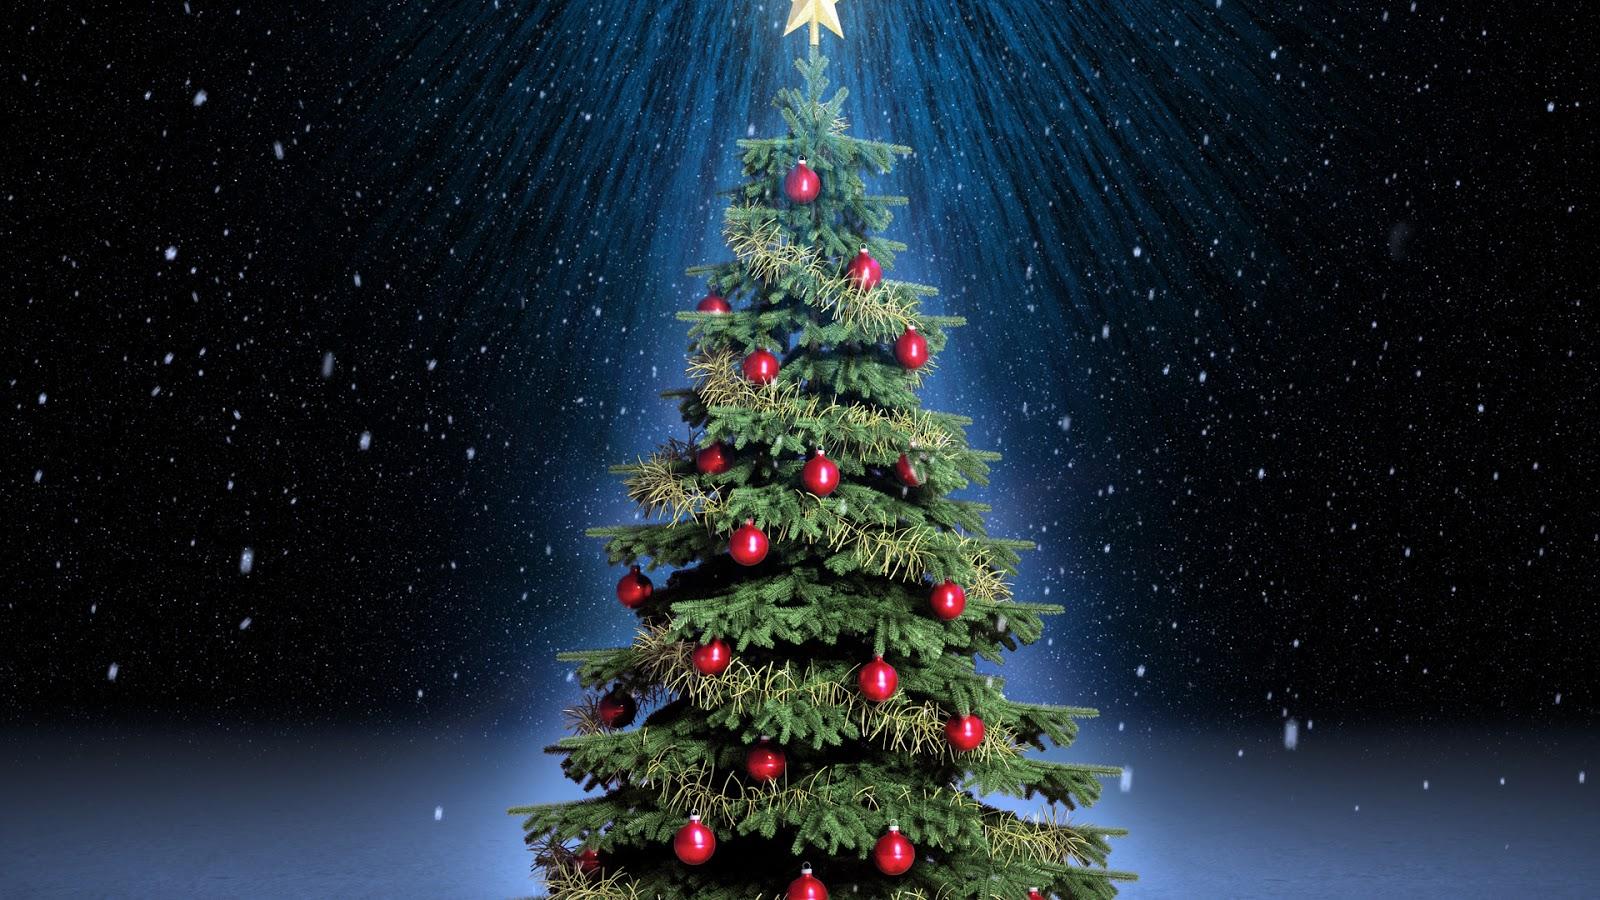 HD Wallpapers Of ChristmasChristmas TreeXmas GiftsMerry Christmas